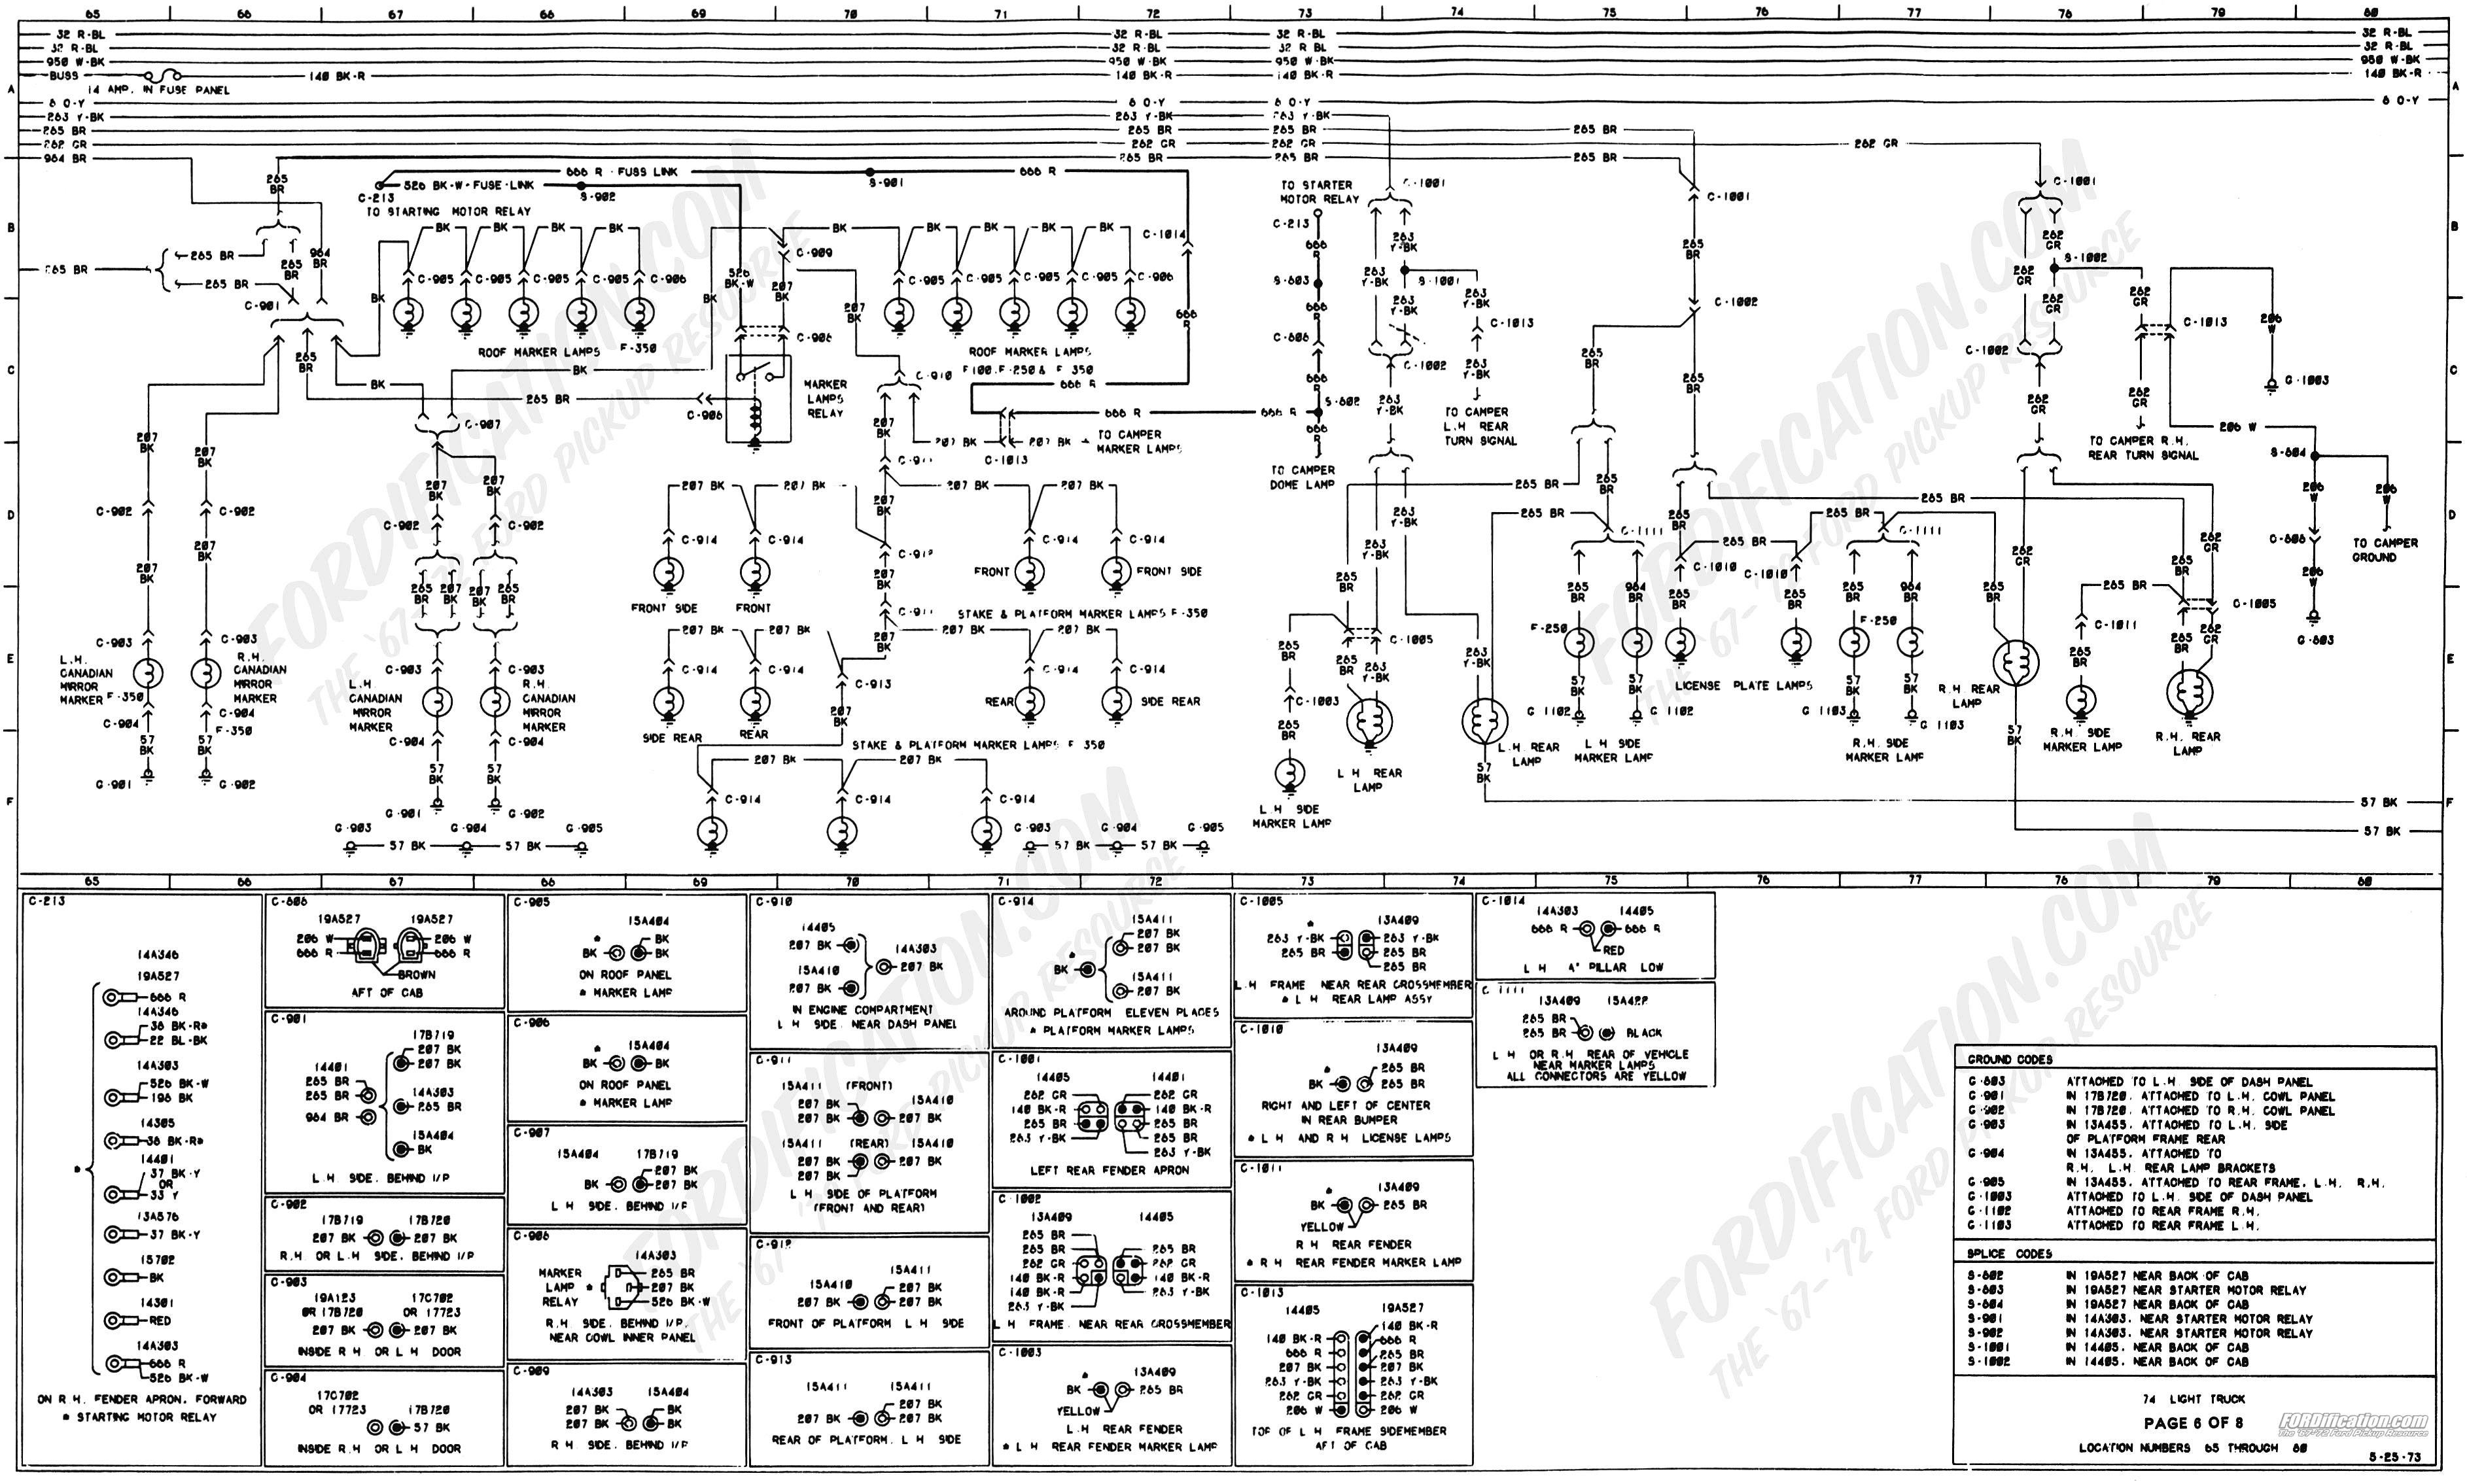 Stearns Brake Wiring Diagram Stearns Brake Wiring Diagram Wiring Diagram Of Stearns Brake Wiring Diagram